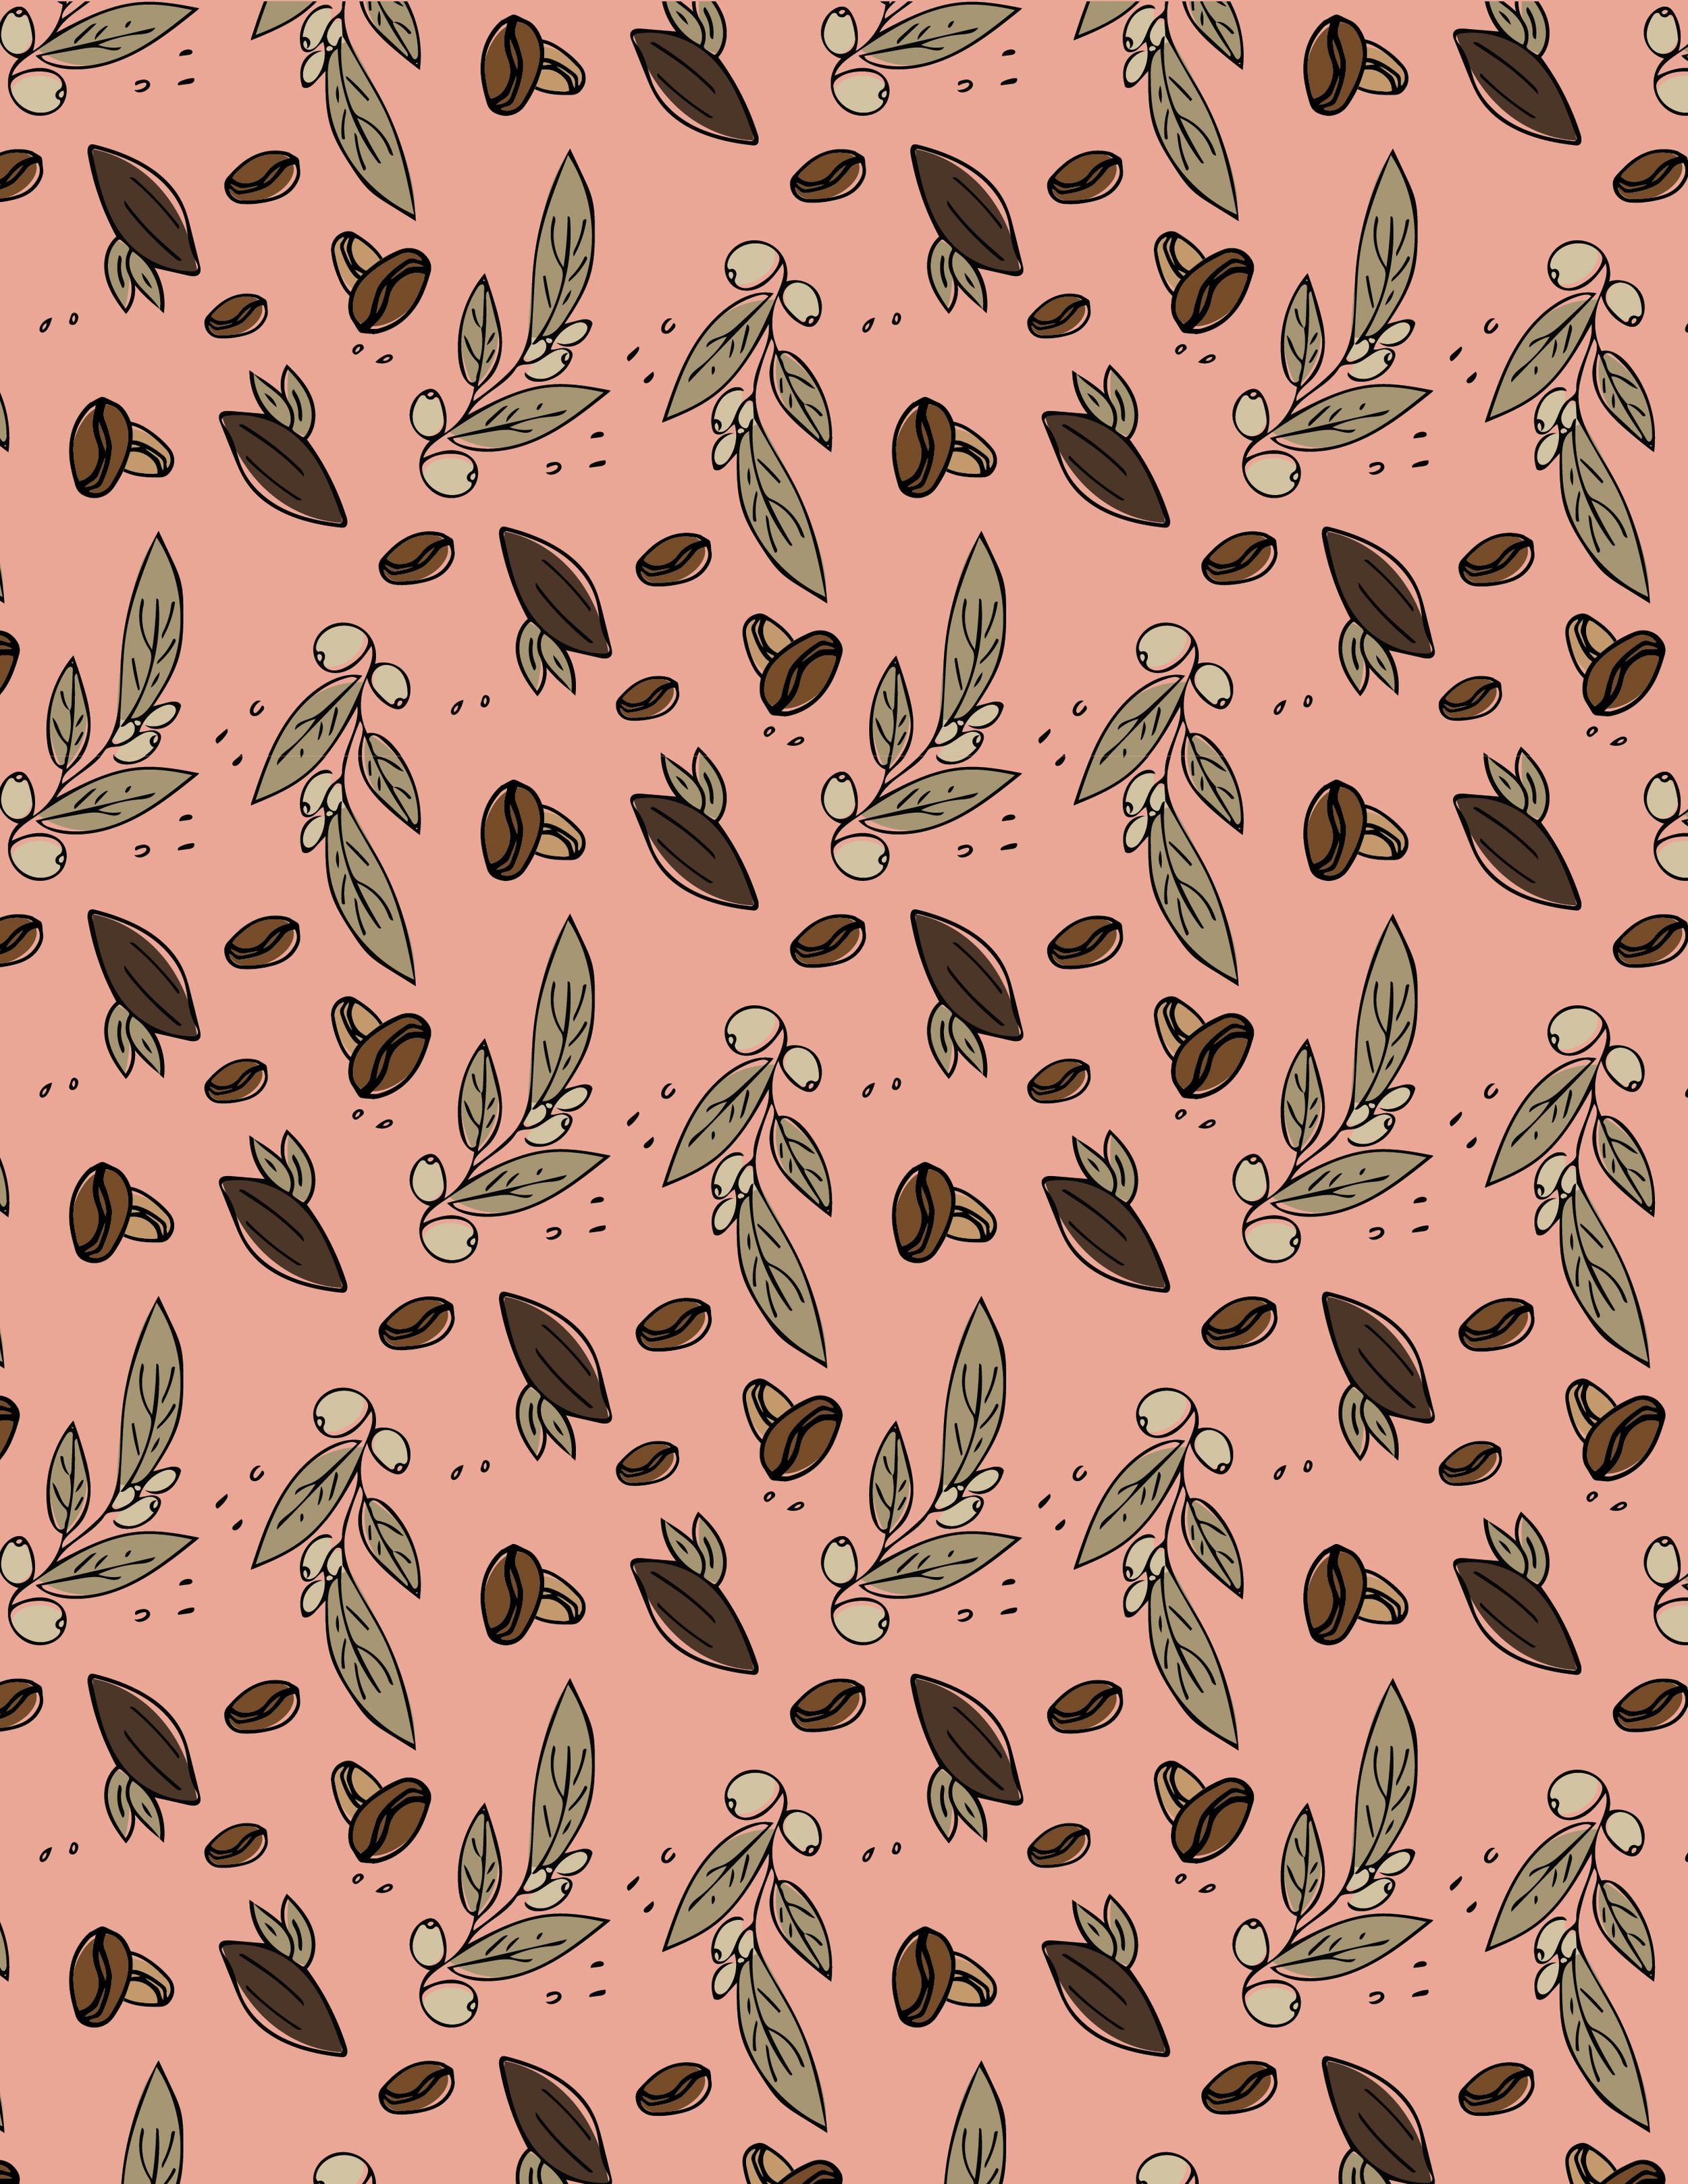 patterns-10.jpg